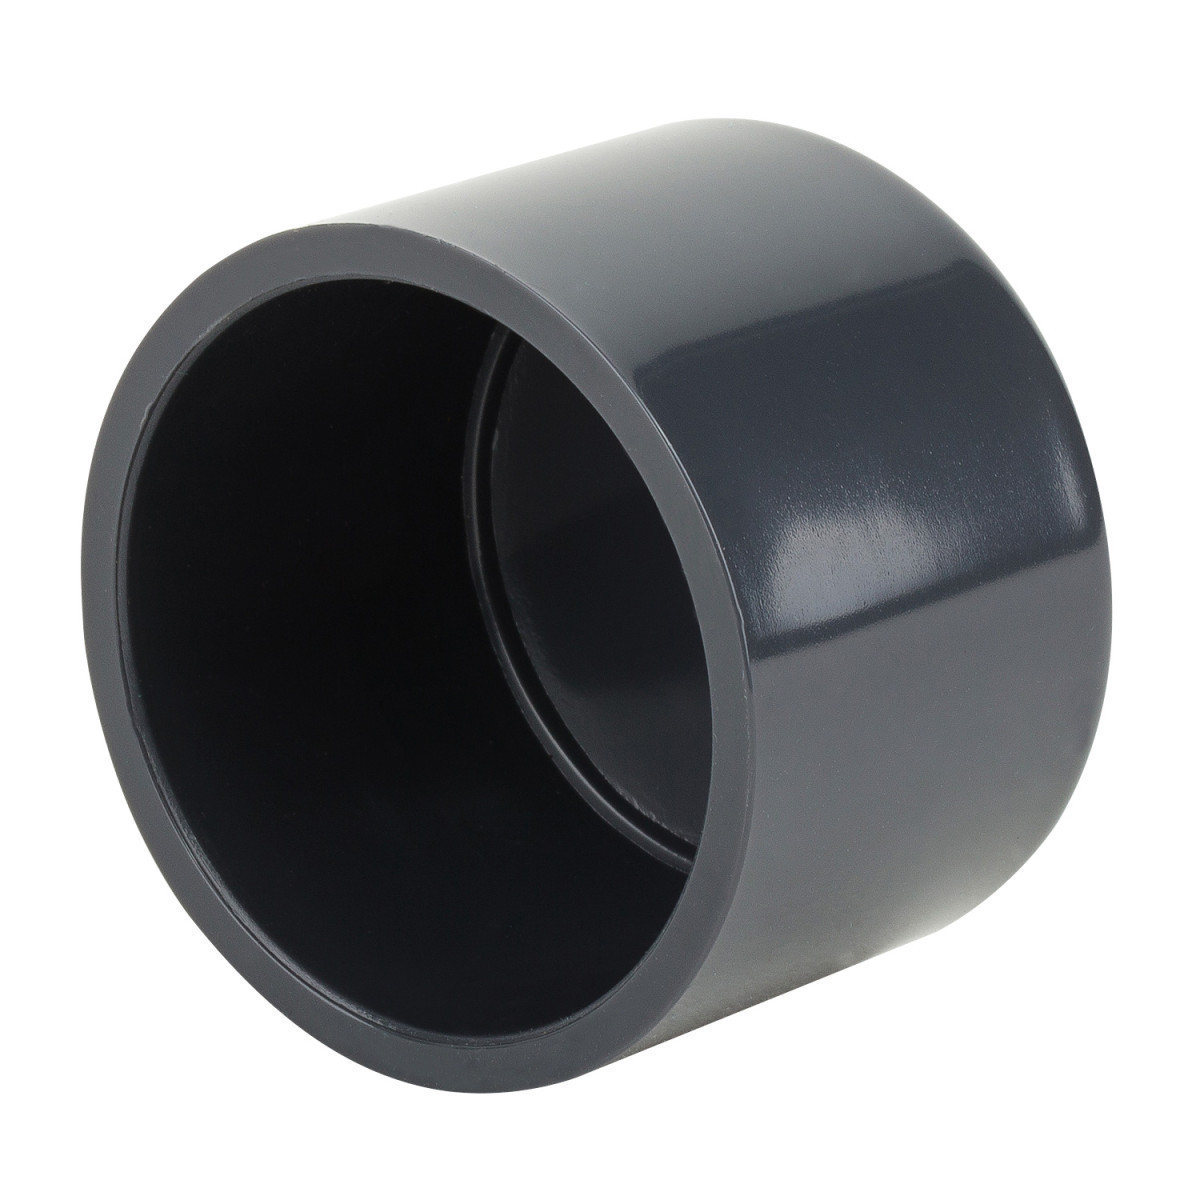 Заглушка ПВХ ERA клеевая, диаметр 90 мм.